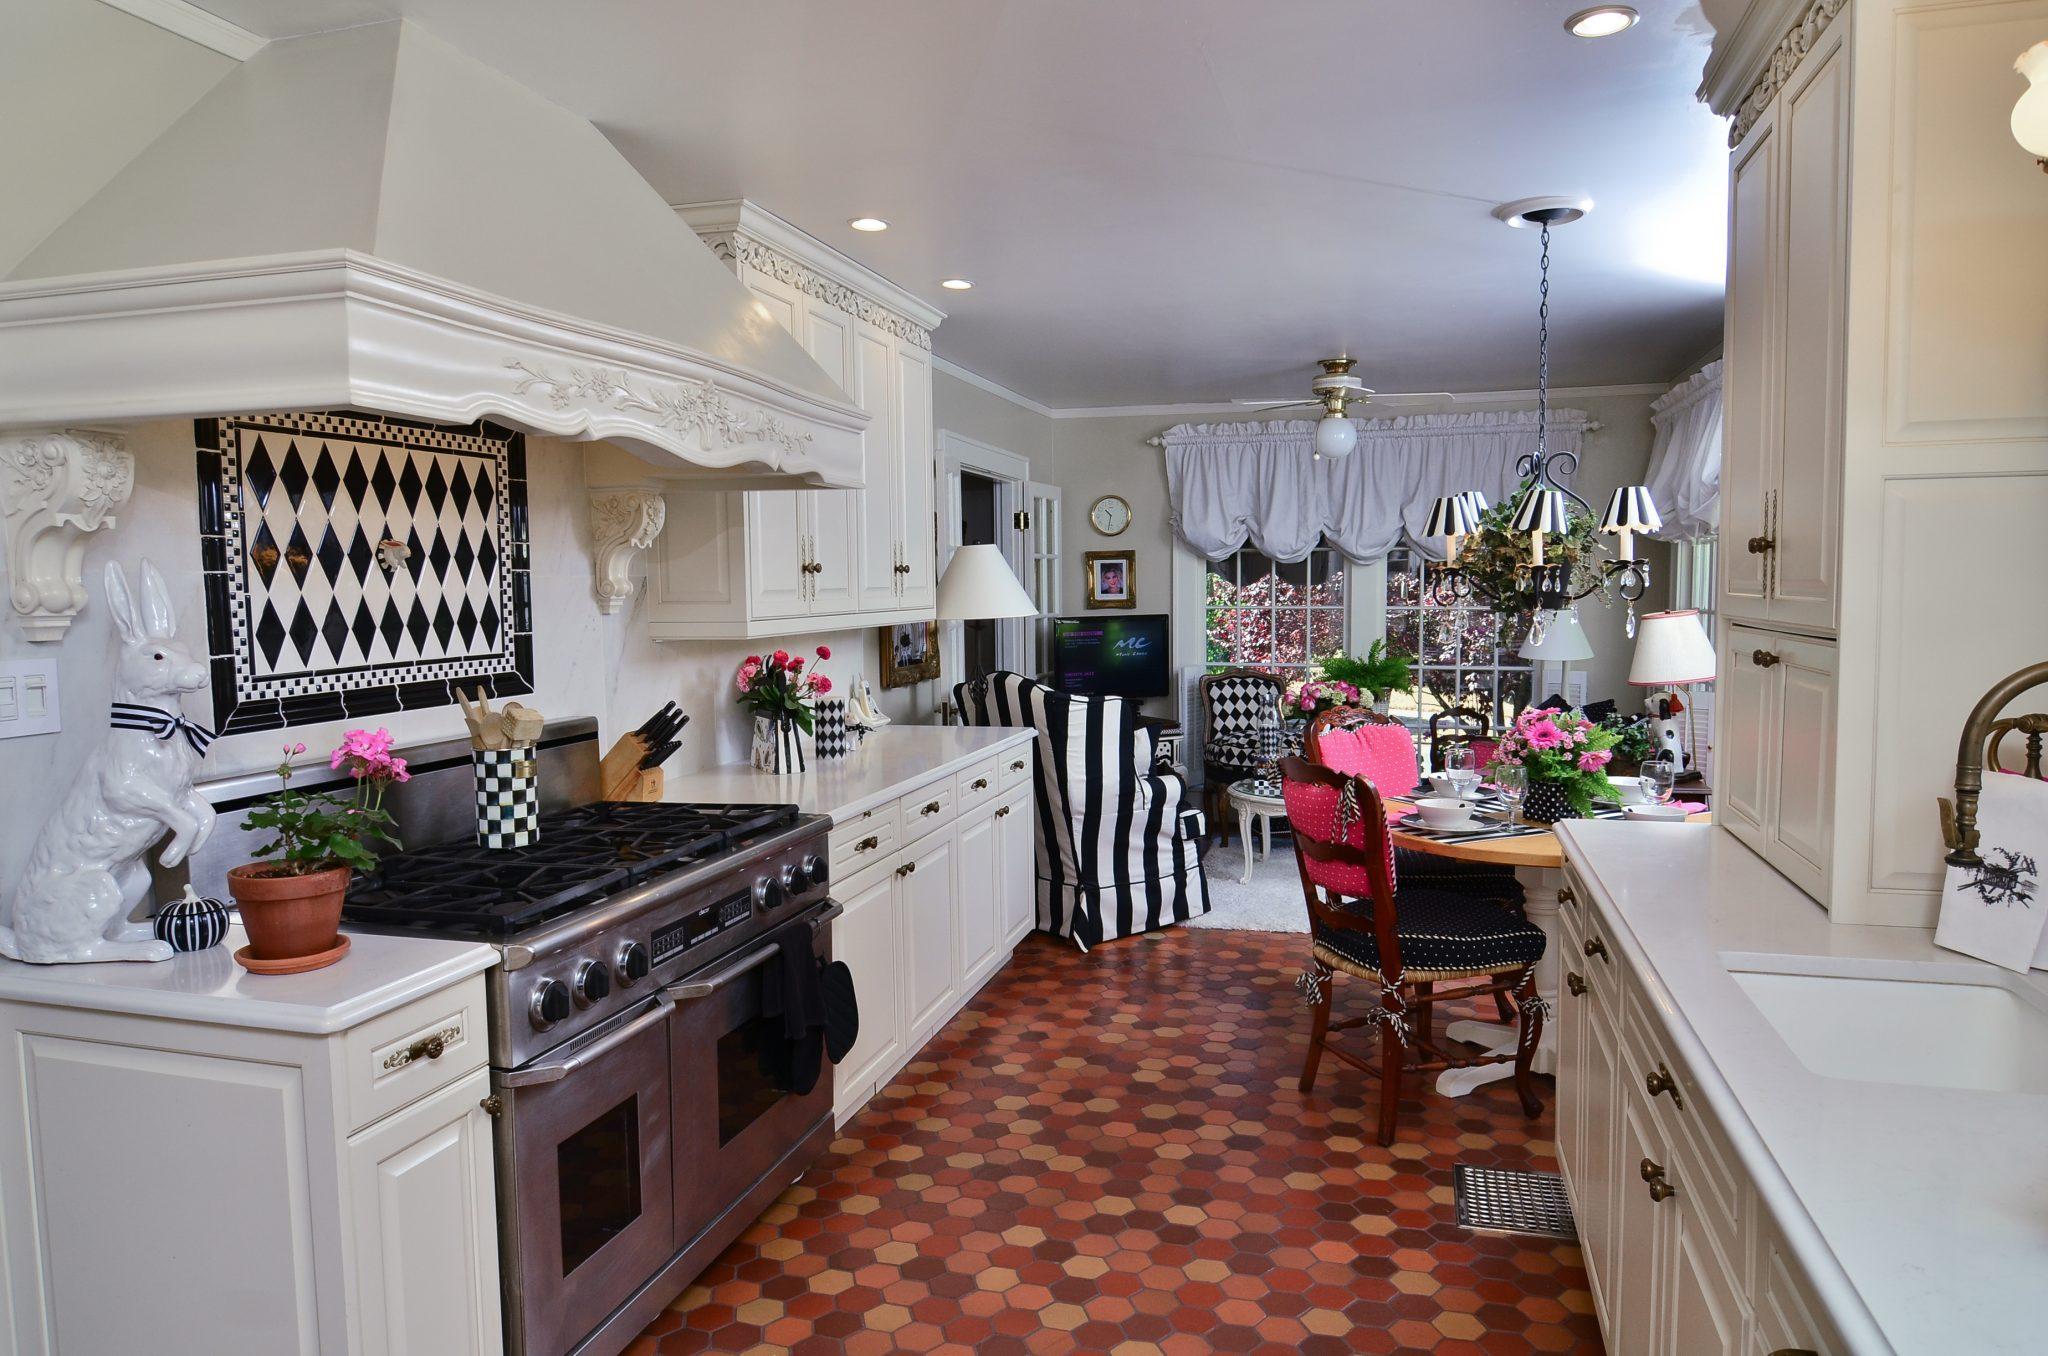 Kitchen layout and design Ovation design-build